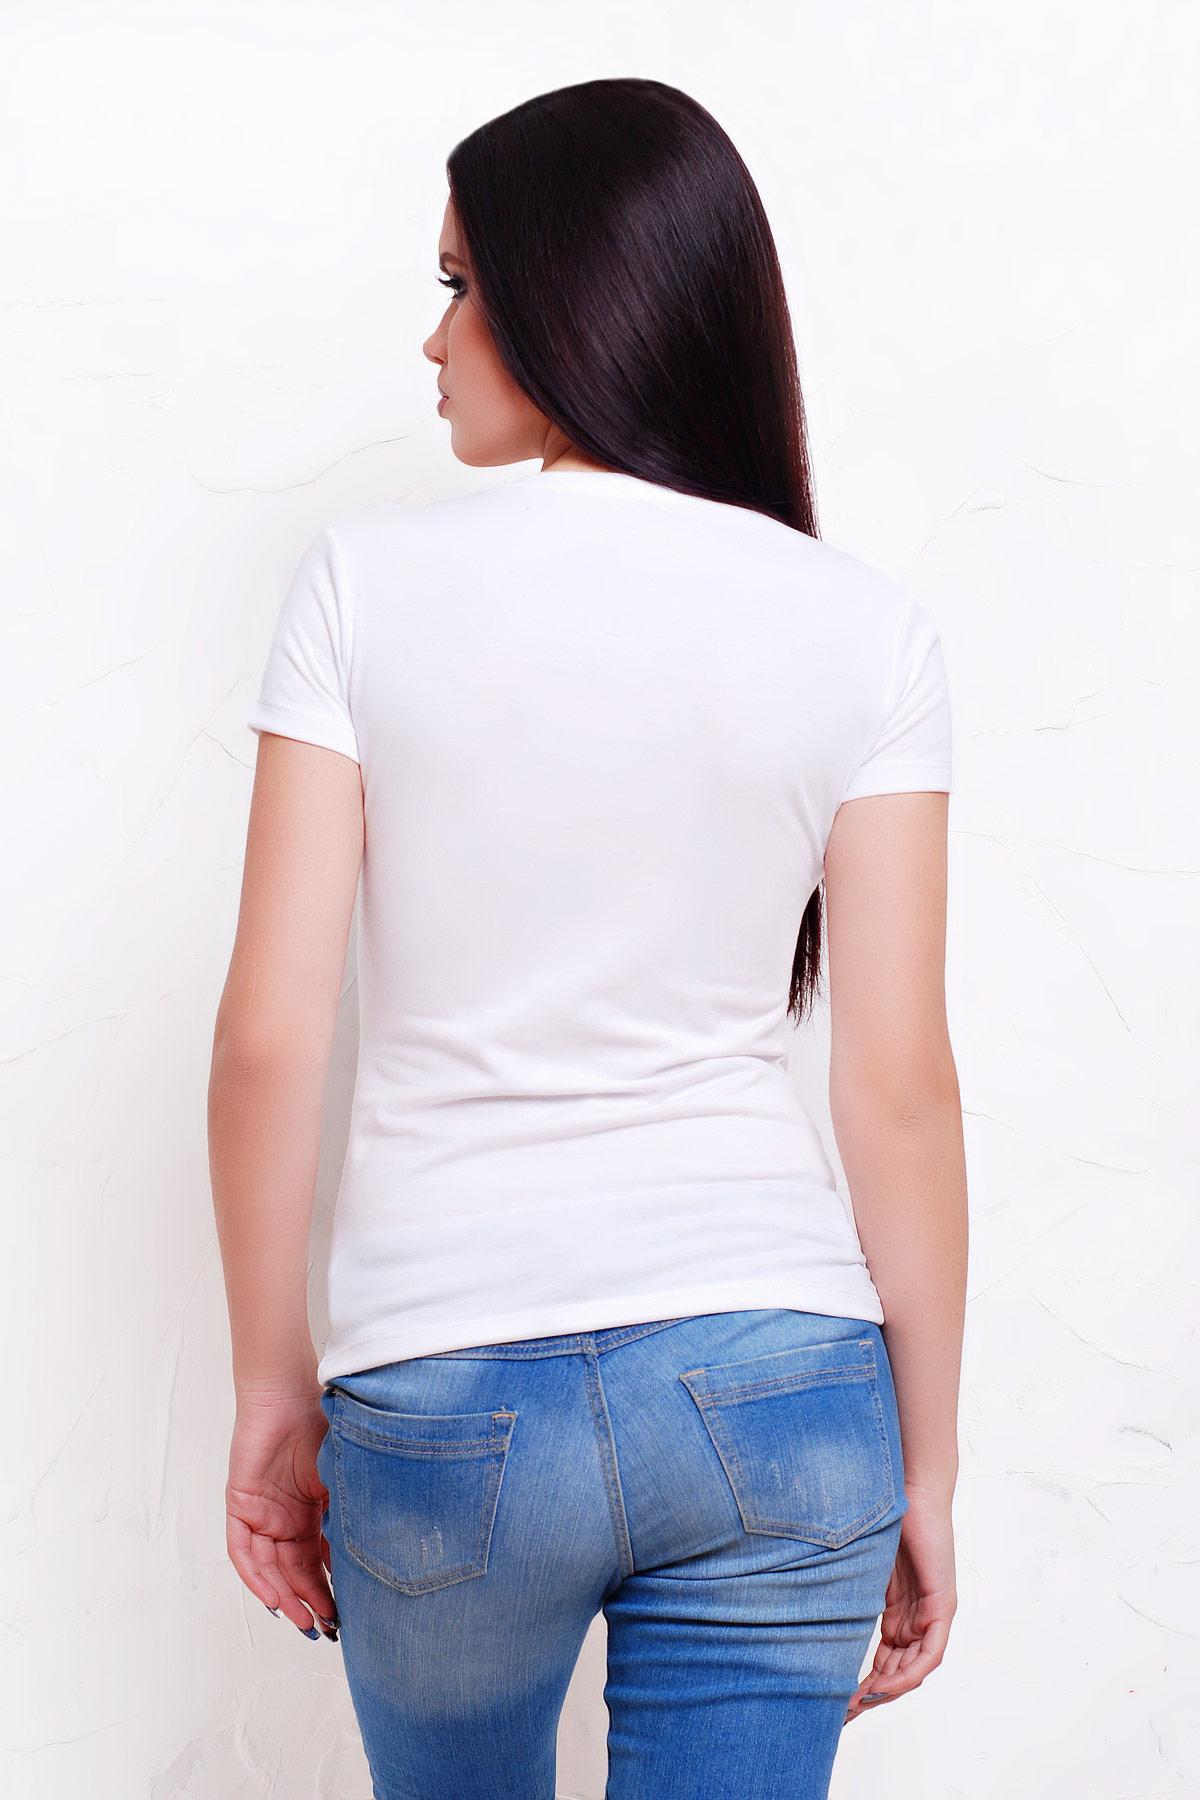 прикольная футболка с губами. Mr. and Ms. Футболка-2В-Б. Цвет: принт